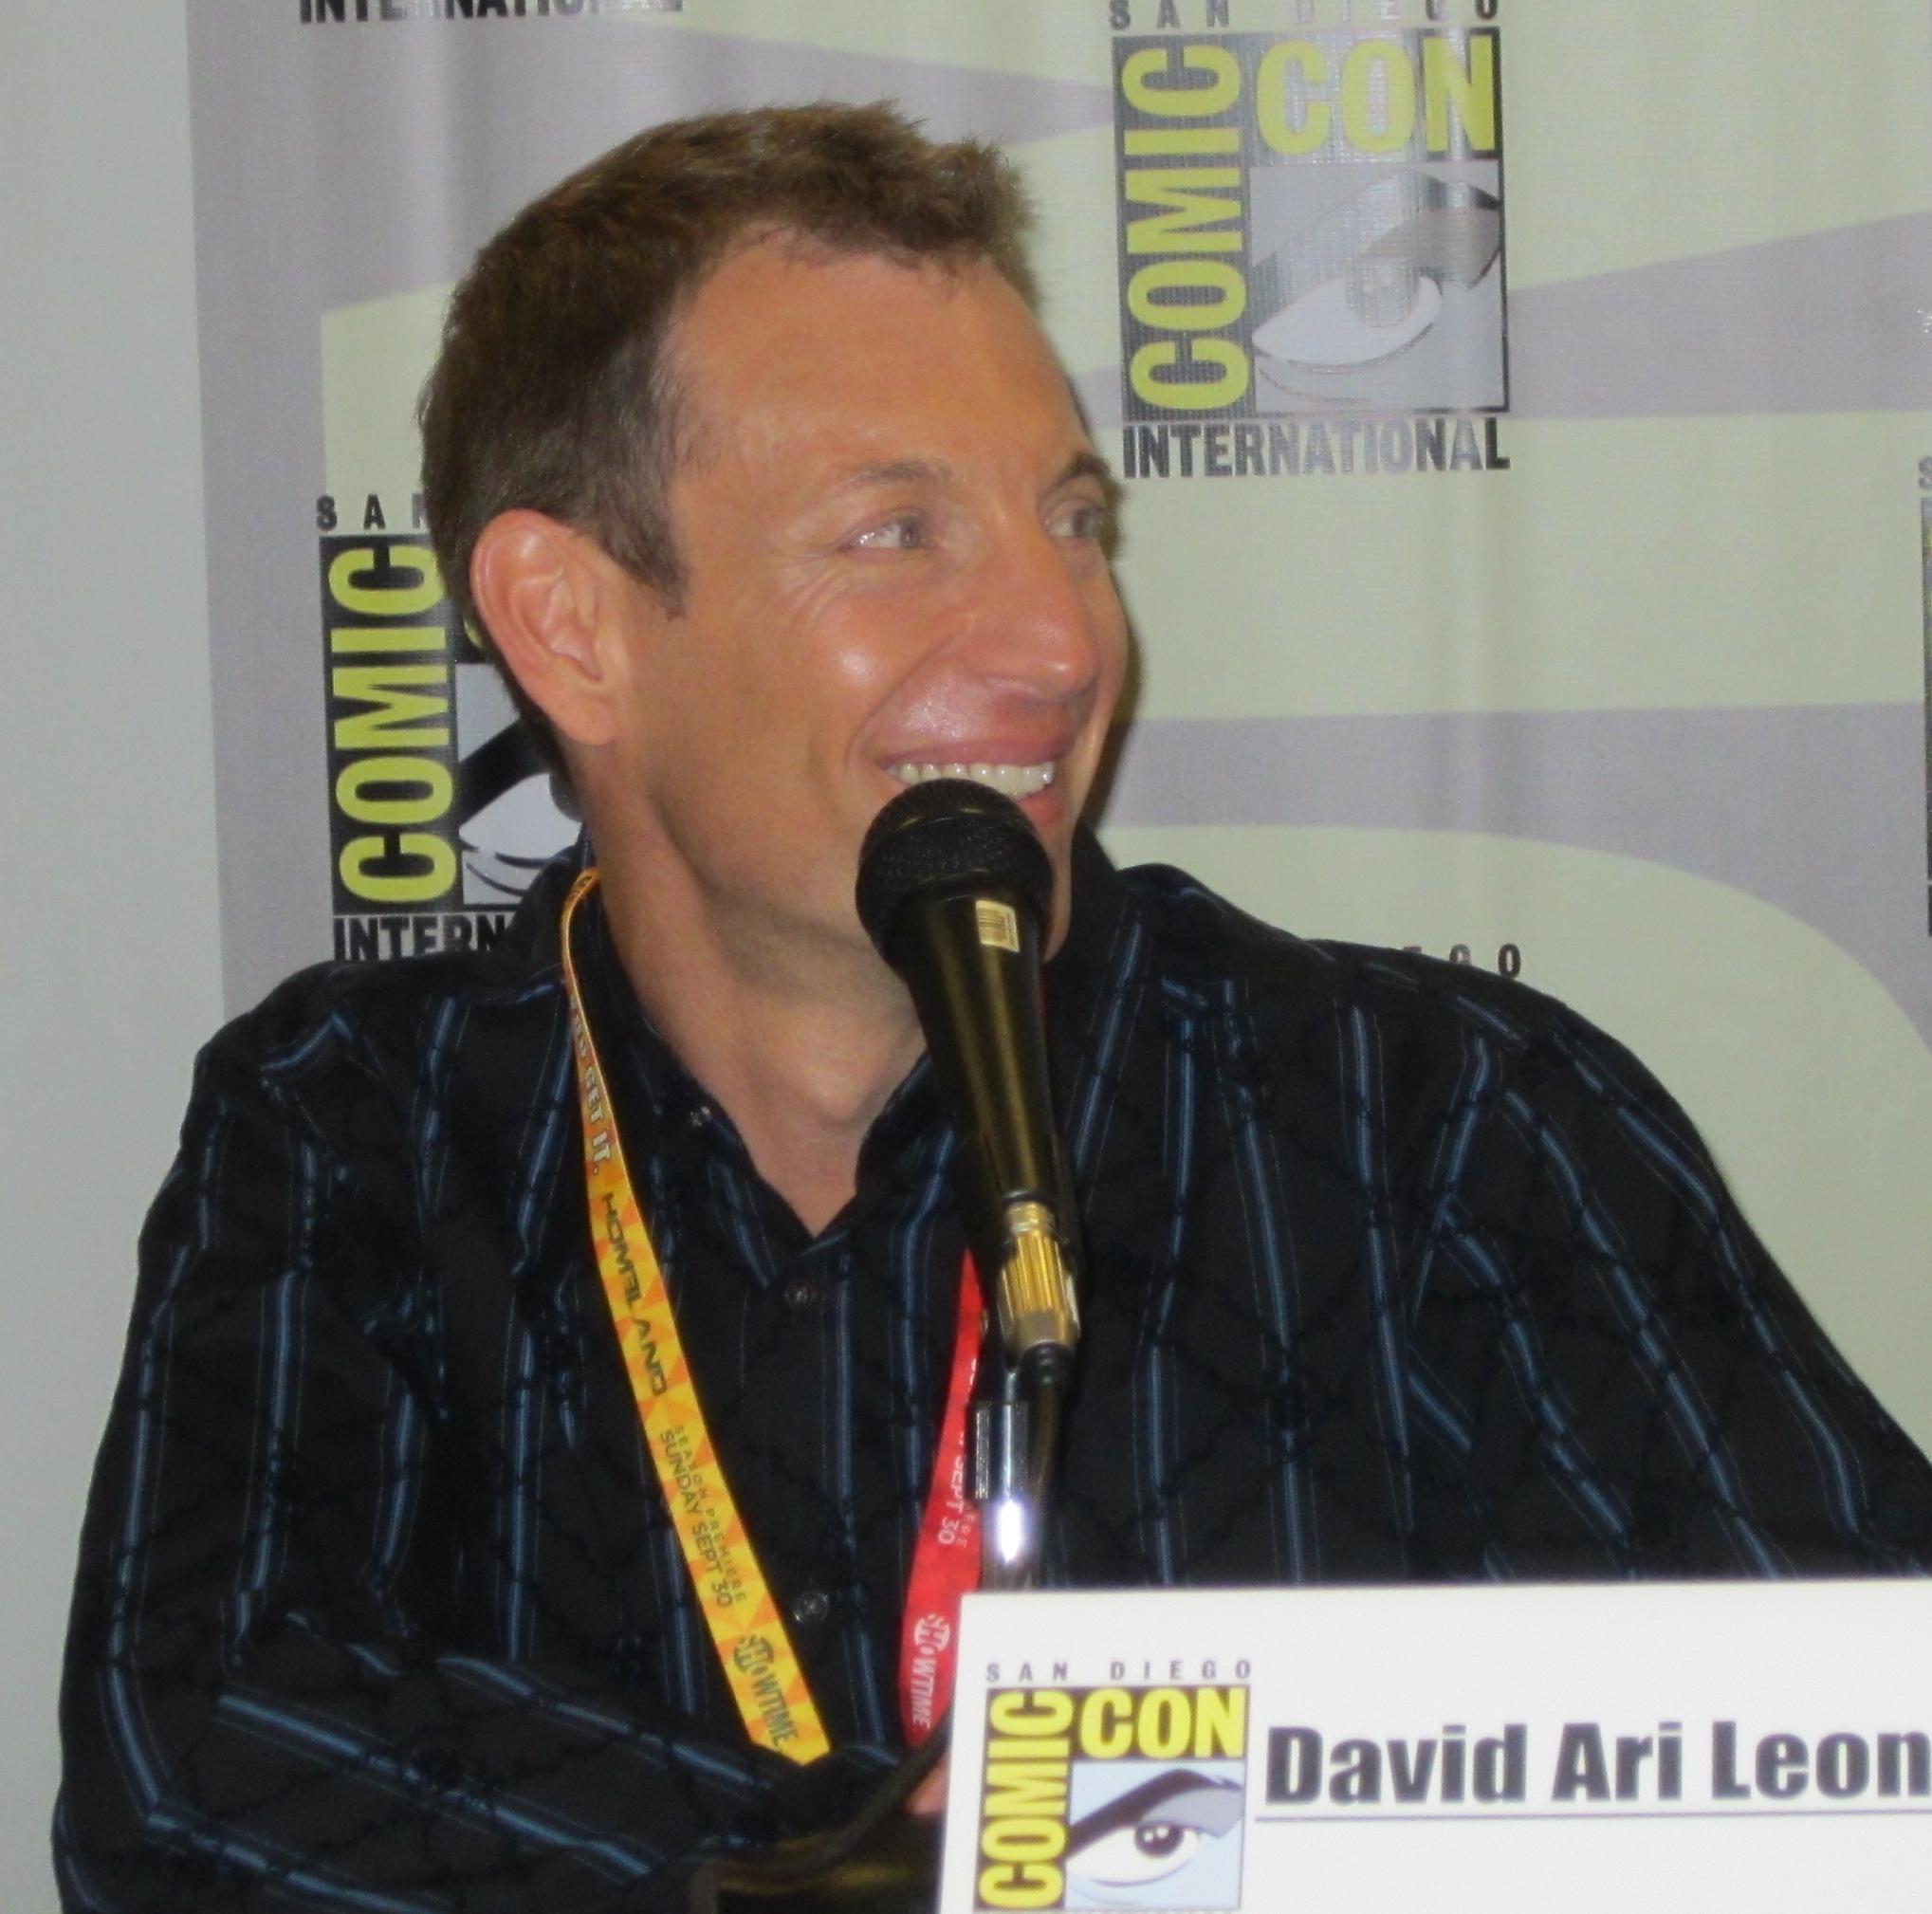 David Ari Leon